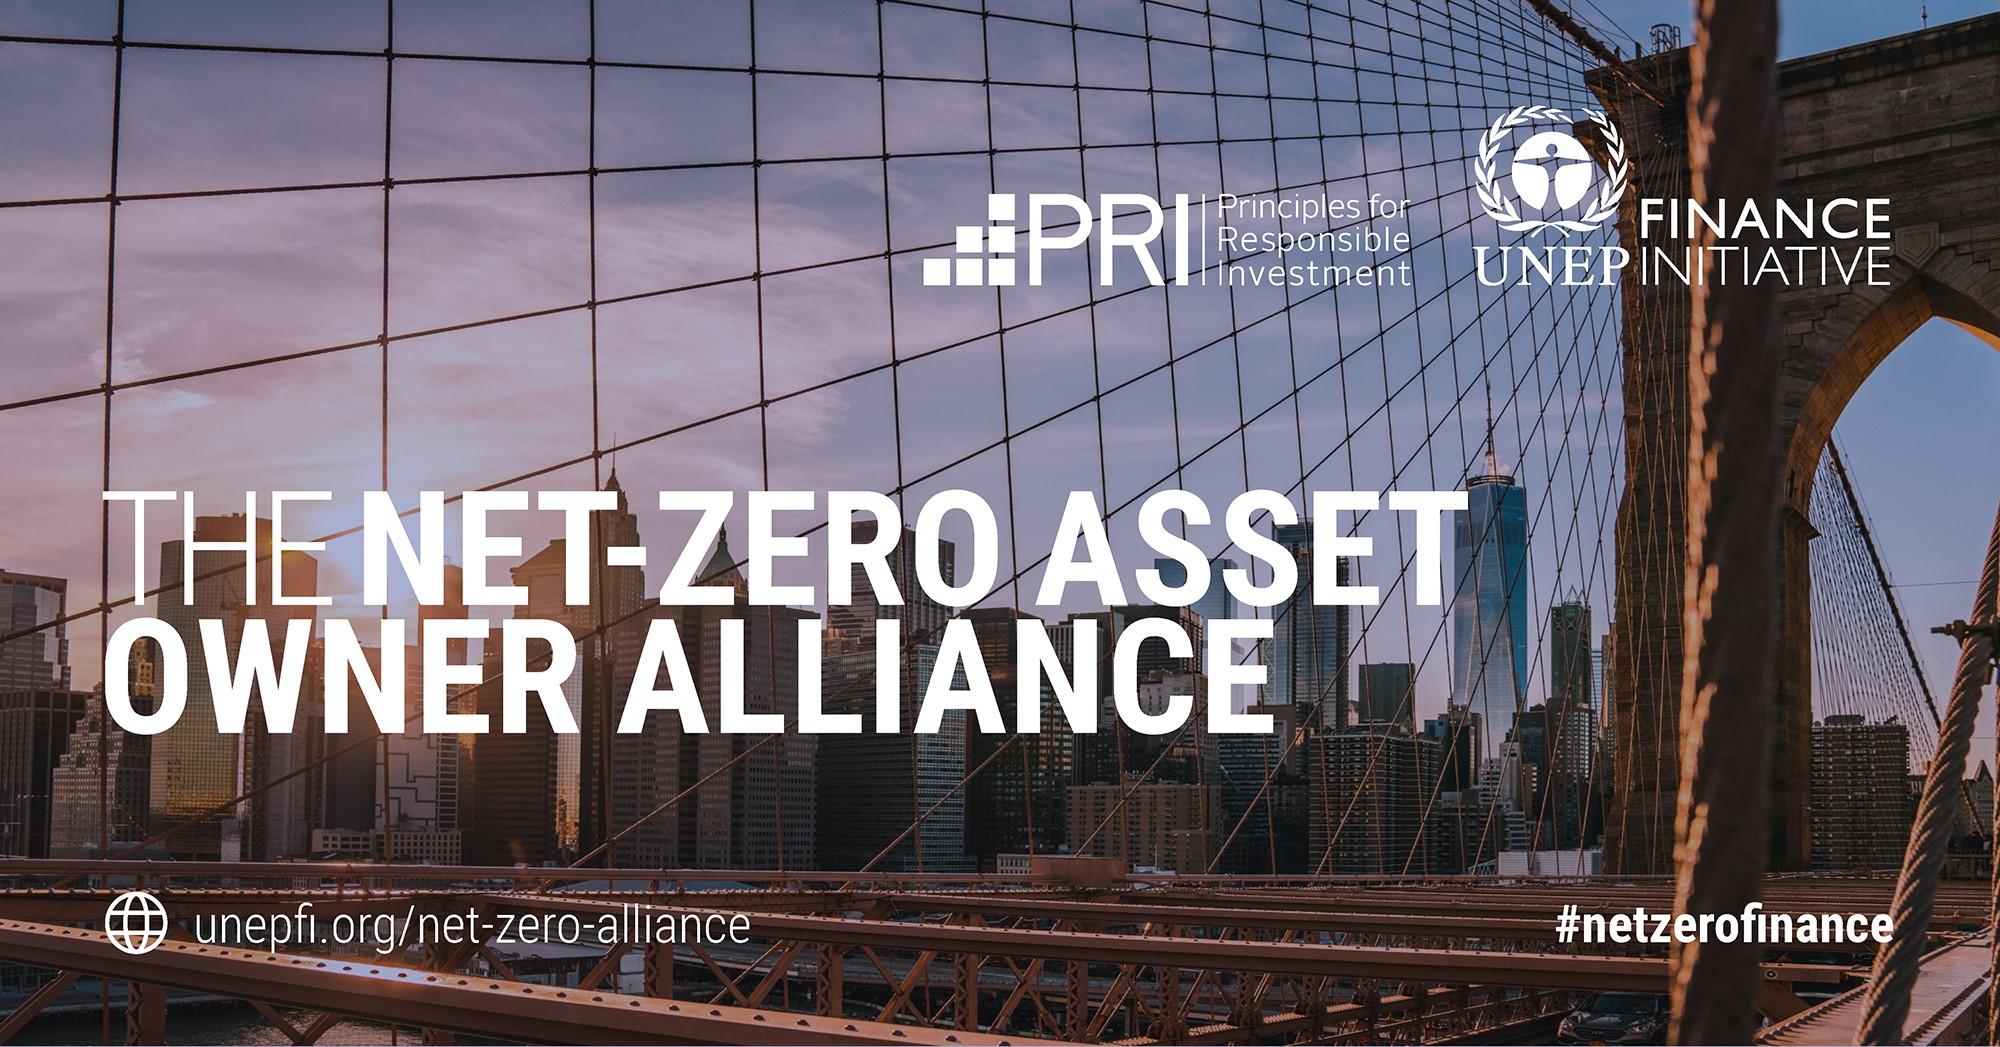 Net-Zero Asset Owner Alliance